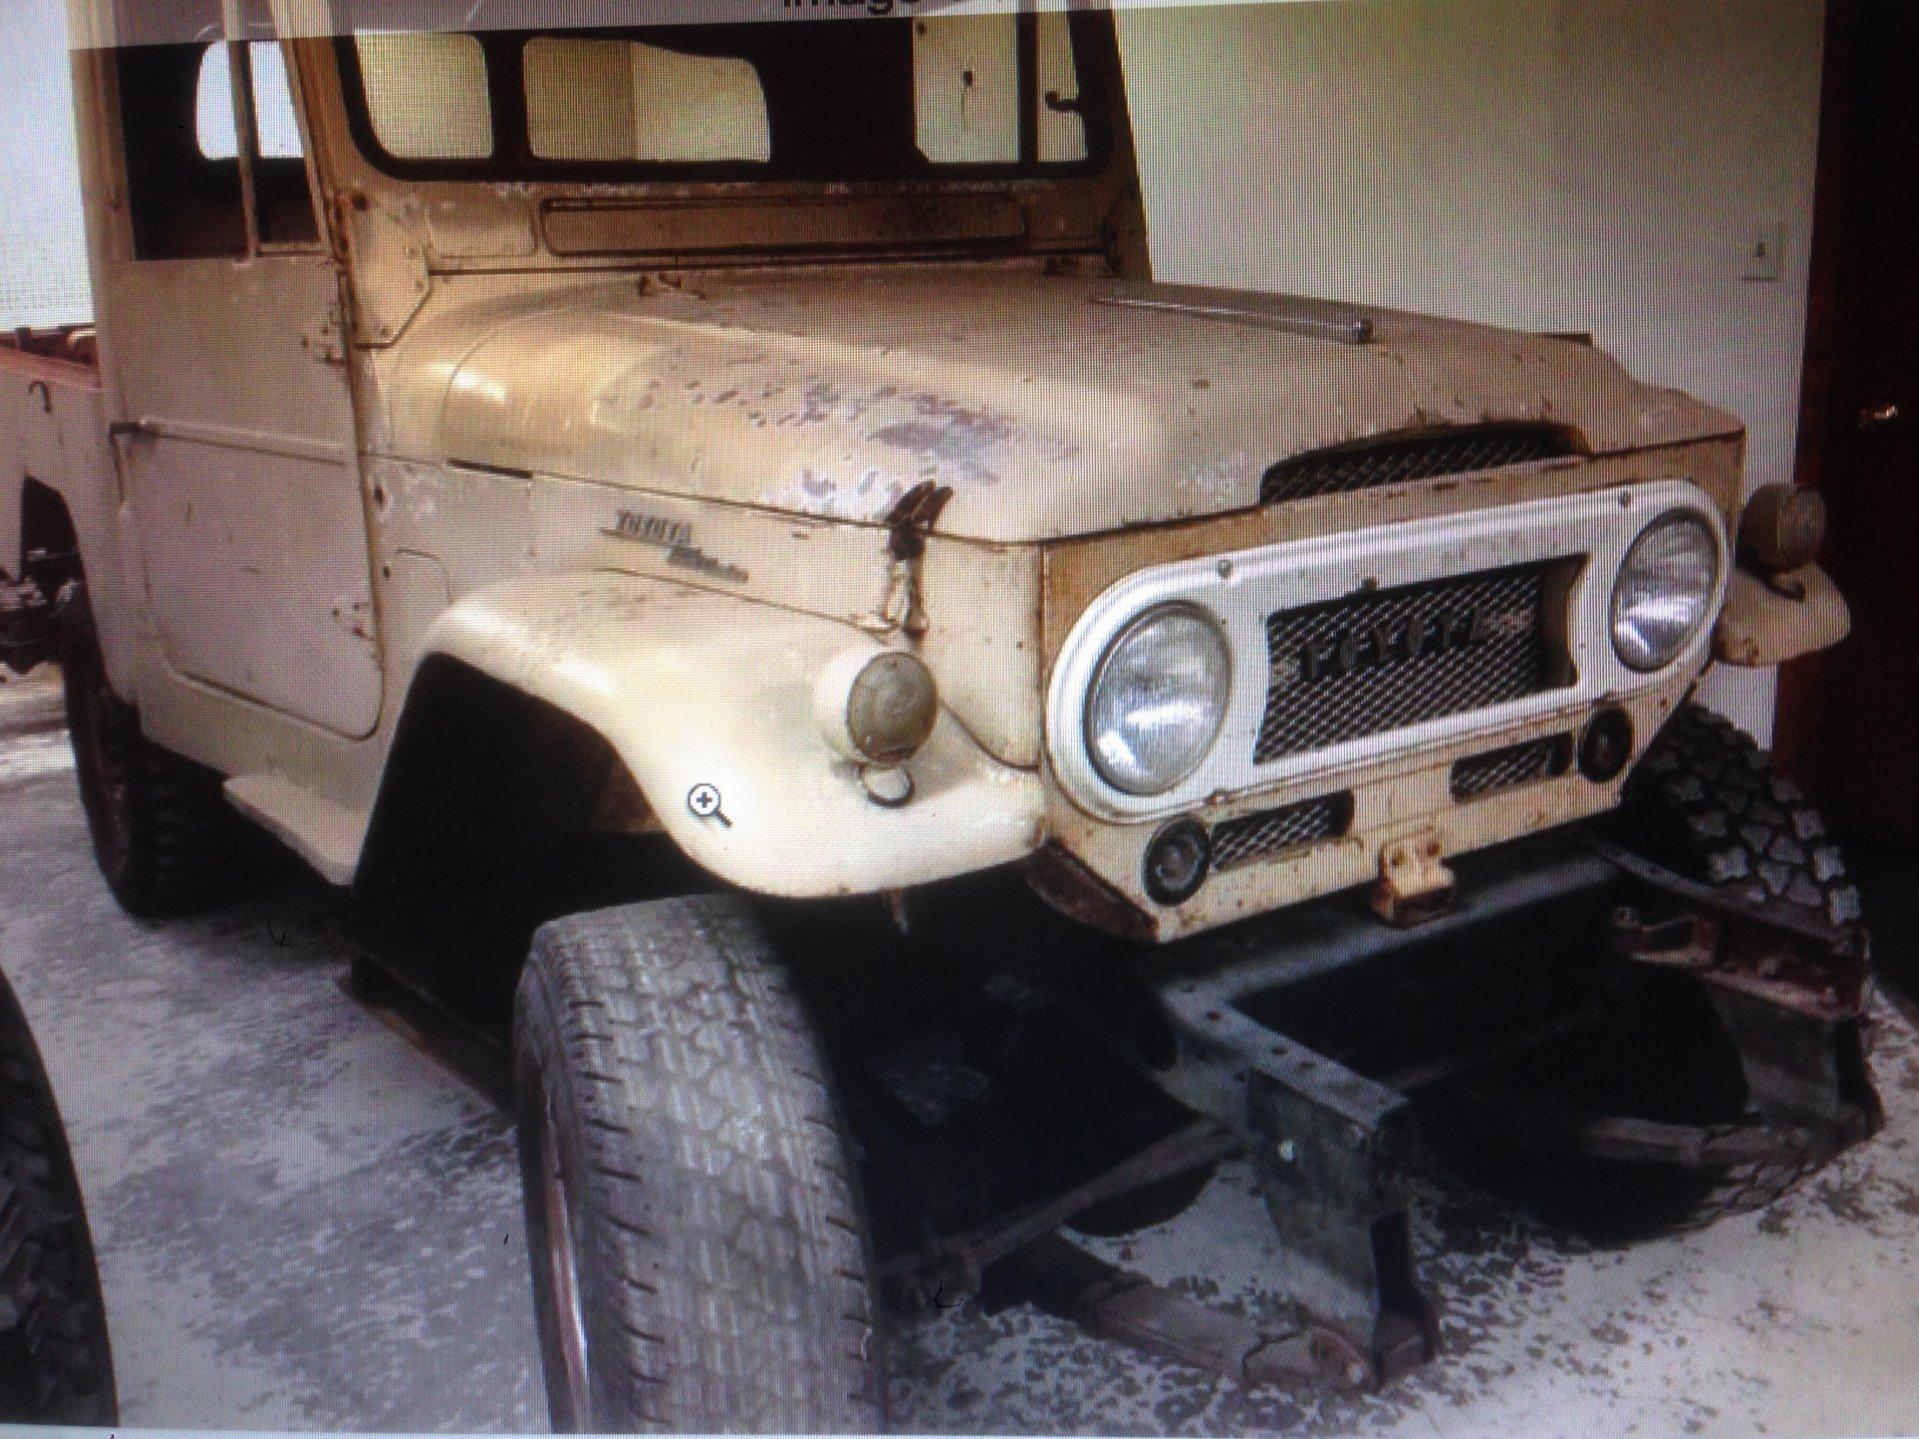 For Sale - 1963 FJ45 SWB | IH8MUD Forum